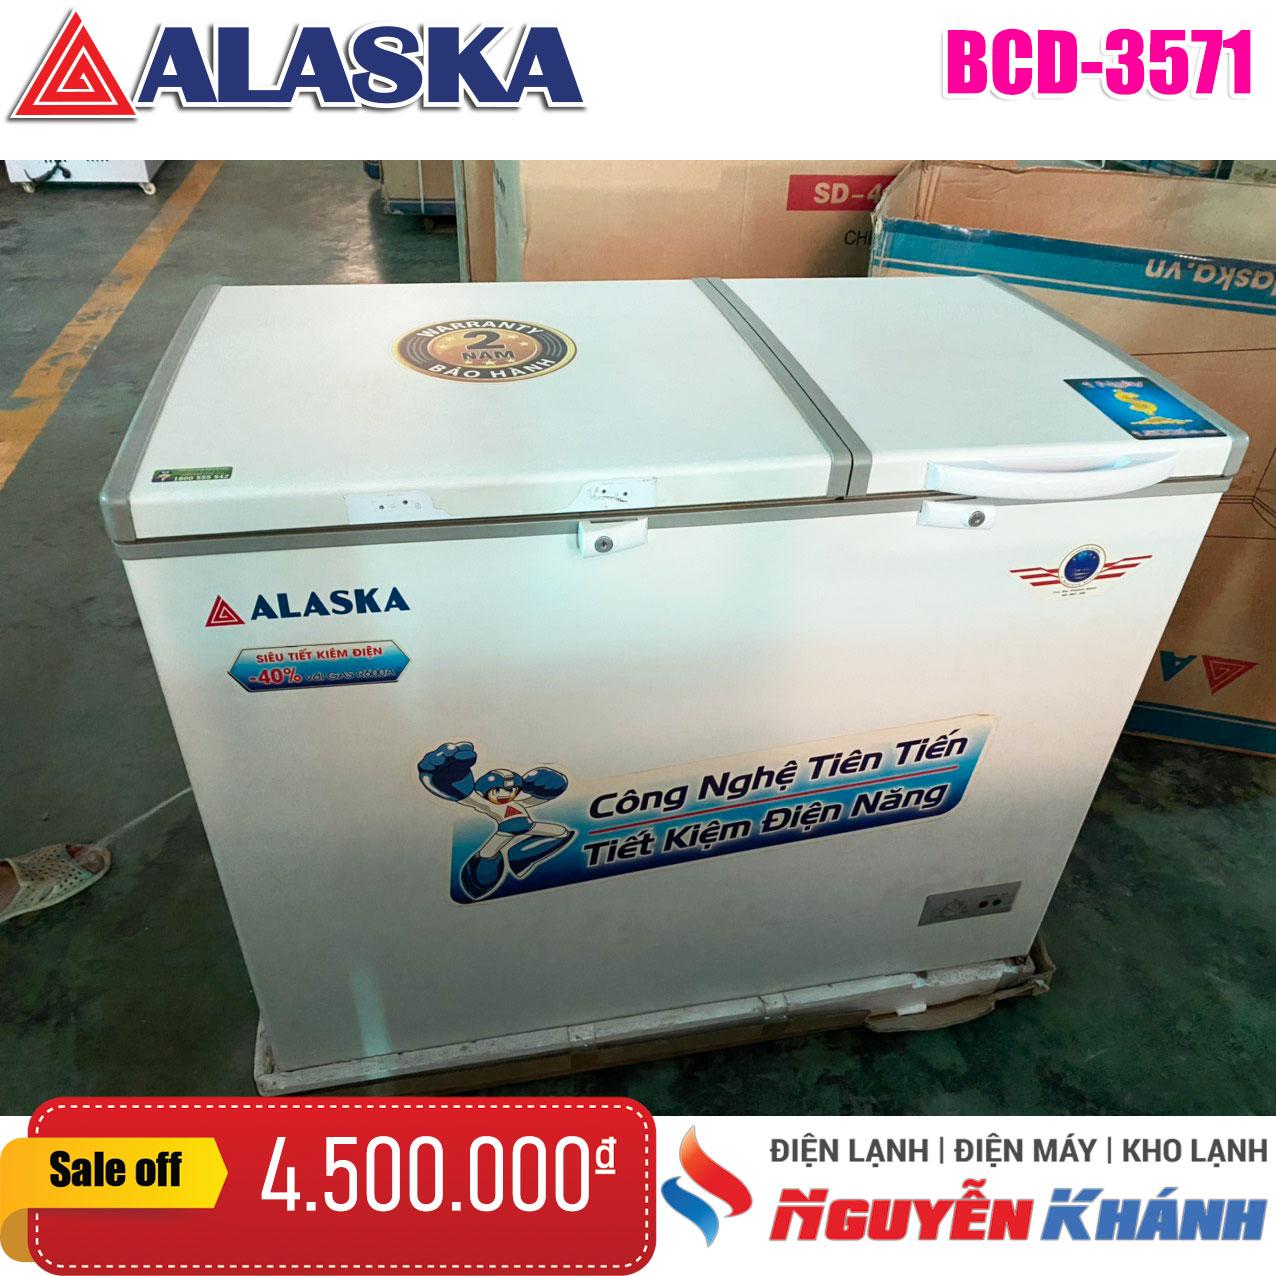 Tủ đông mát Alaska 350 lít BCD-3571